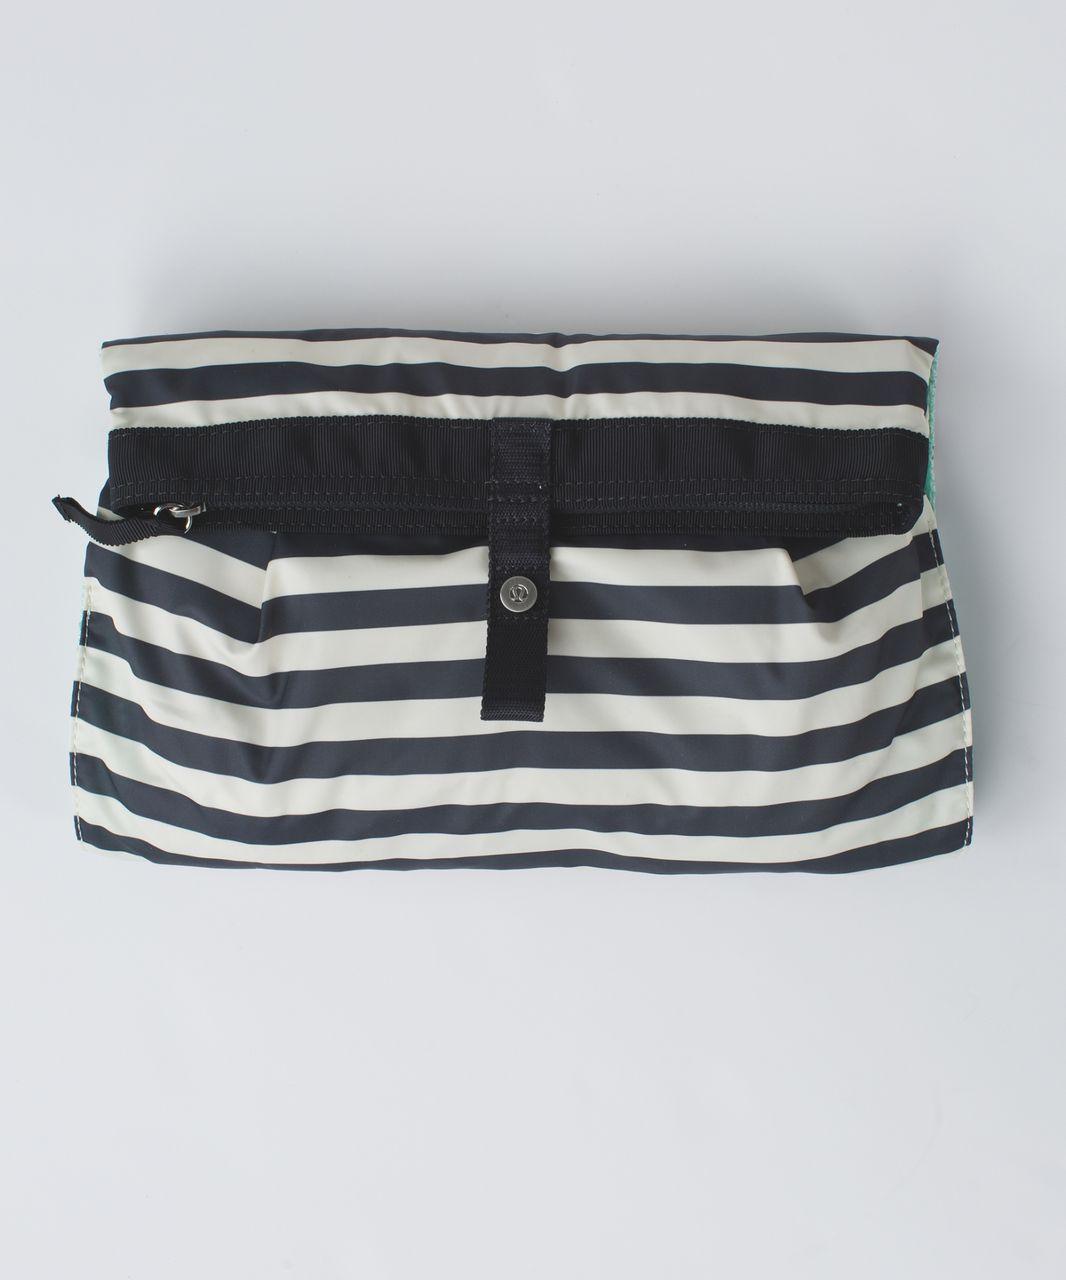 Lululemon Sweaty Or Not Kit - Apex Stripe Printed Angel Wing Dark Slate / Deep Coal / Sea Mist